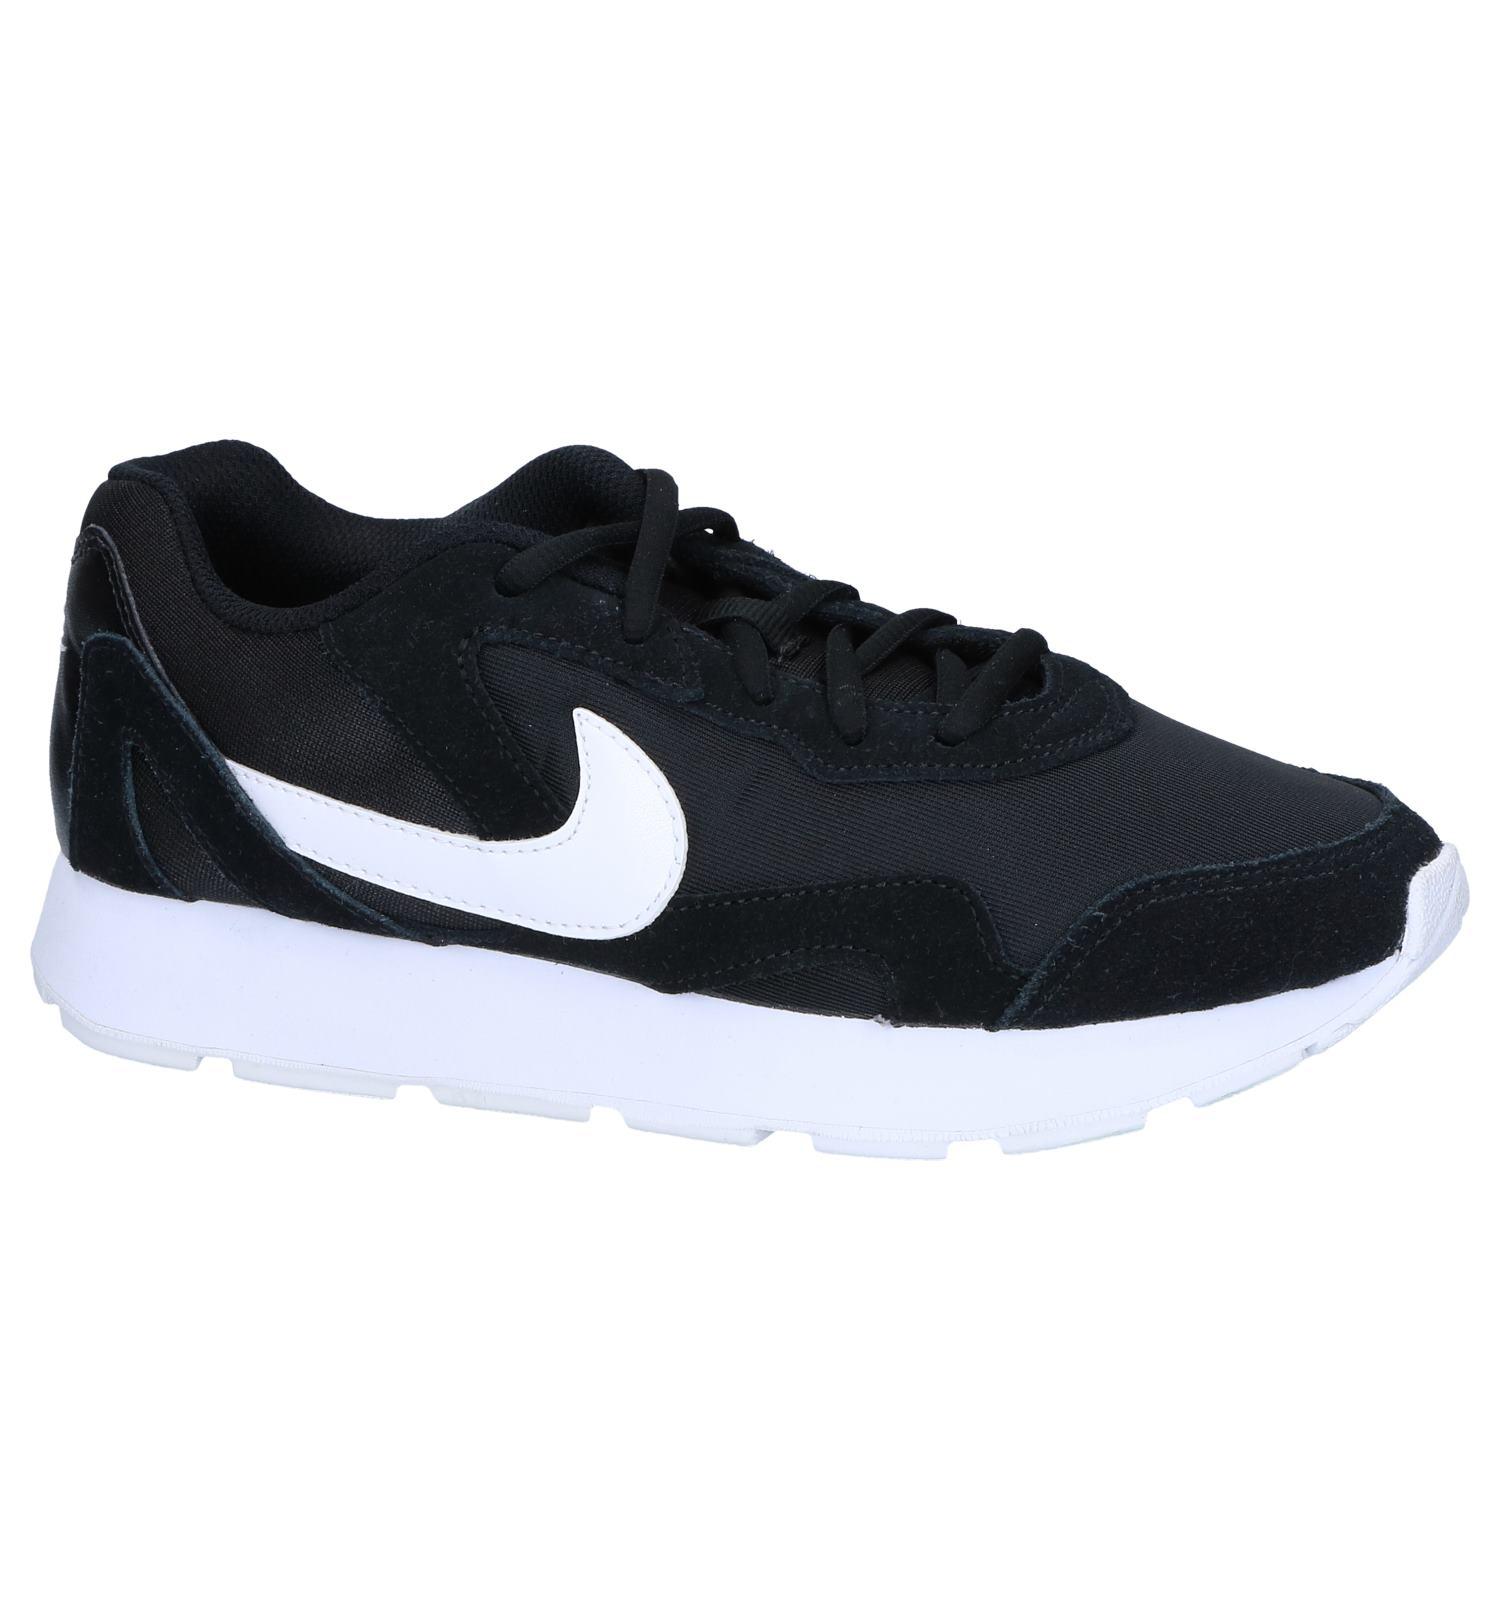 designer fashion 748f3 c2c2e Zwarte Sneakers Nike Delfine   TORFS.BE   Gratis verzend en retour